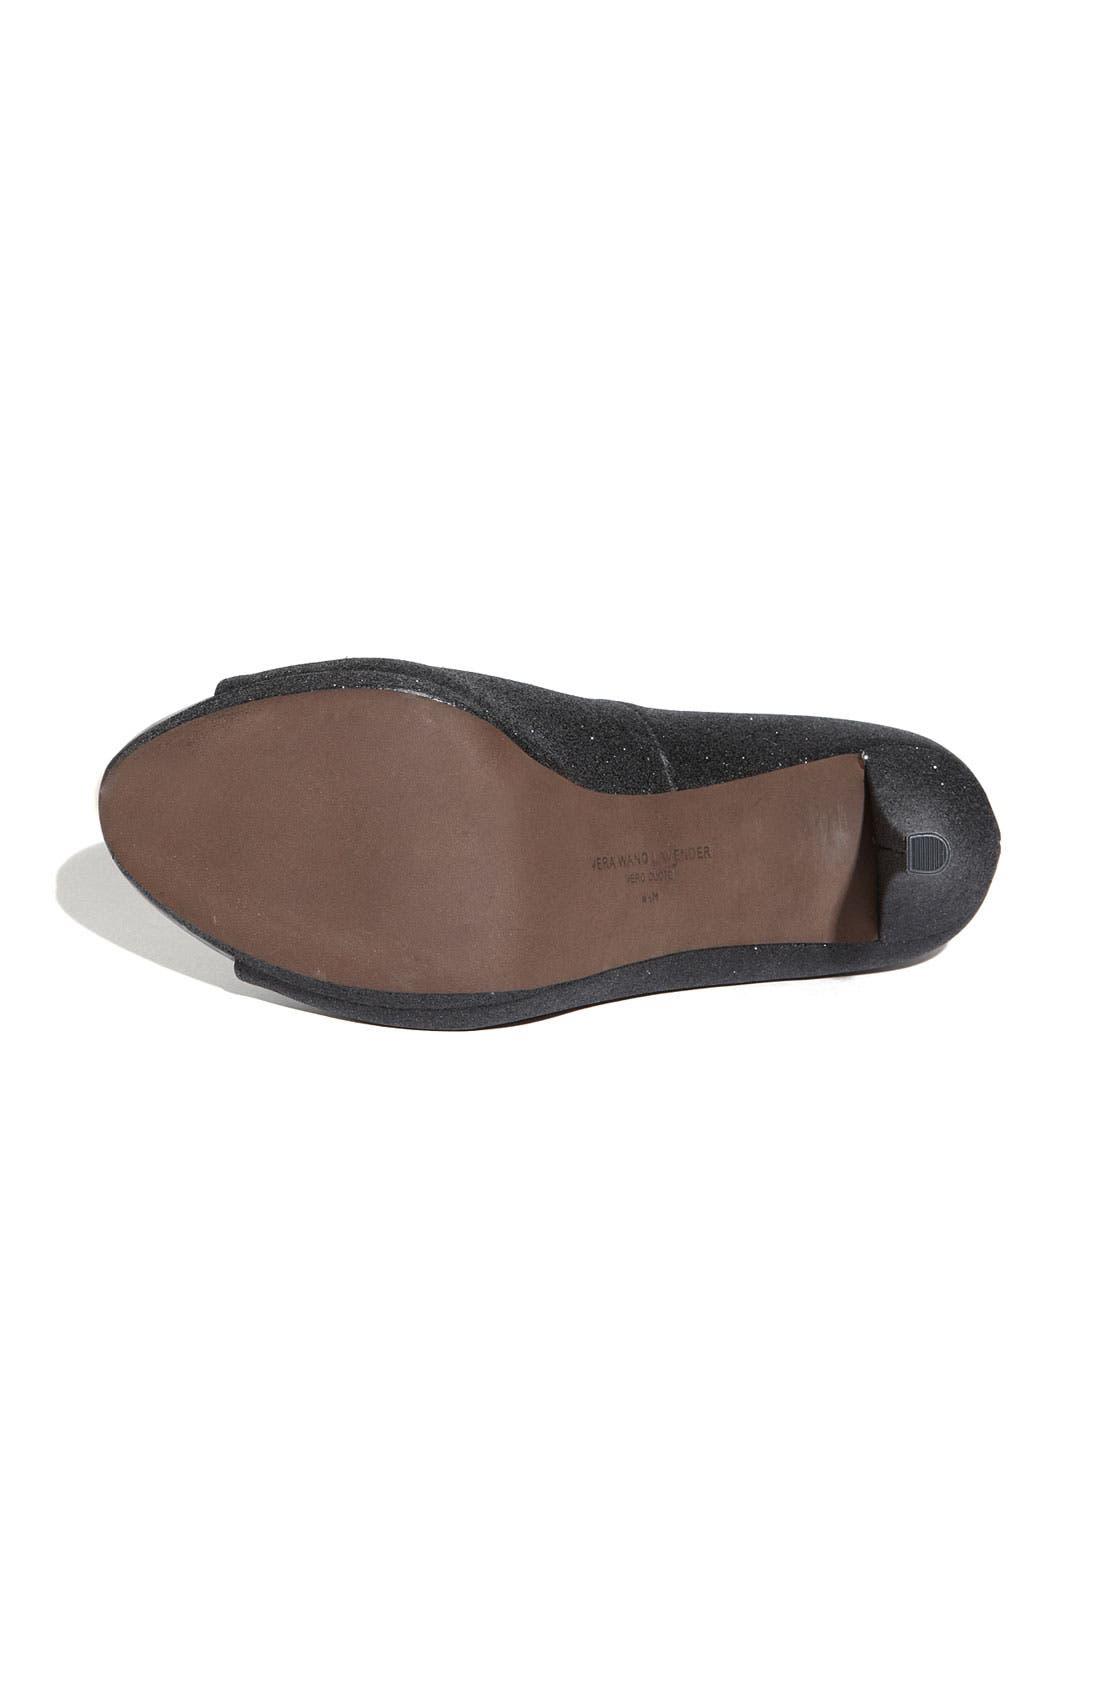 Footwear 'Selima' Peep Toe Pump,                             Alternate thumbnail 20, color,